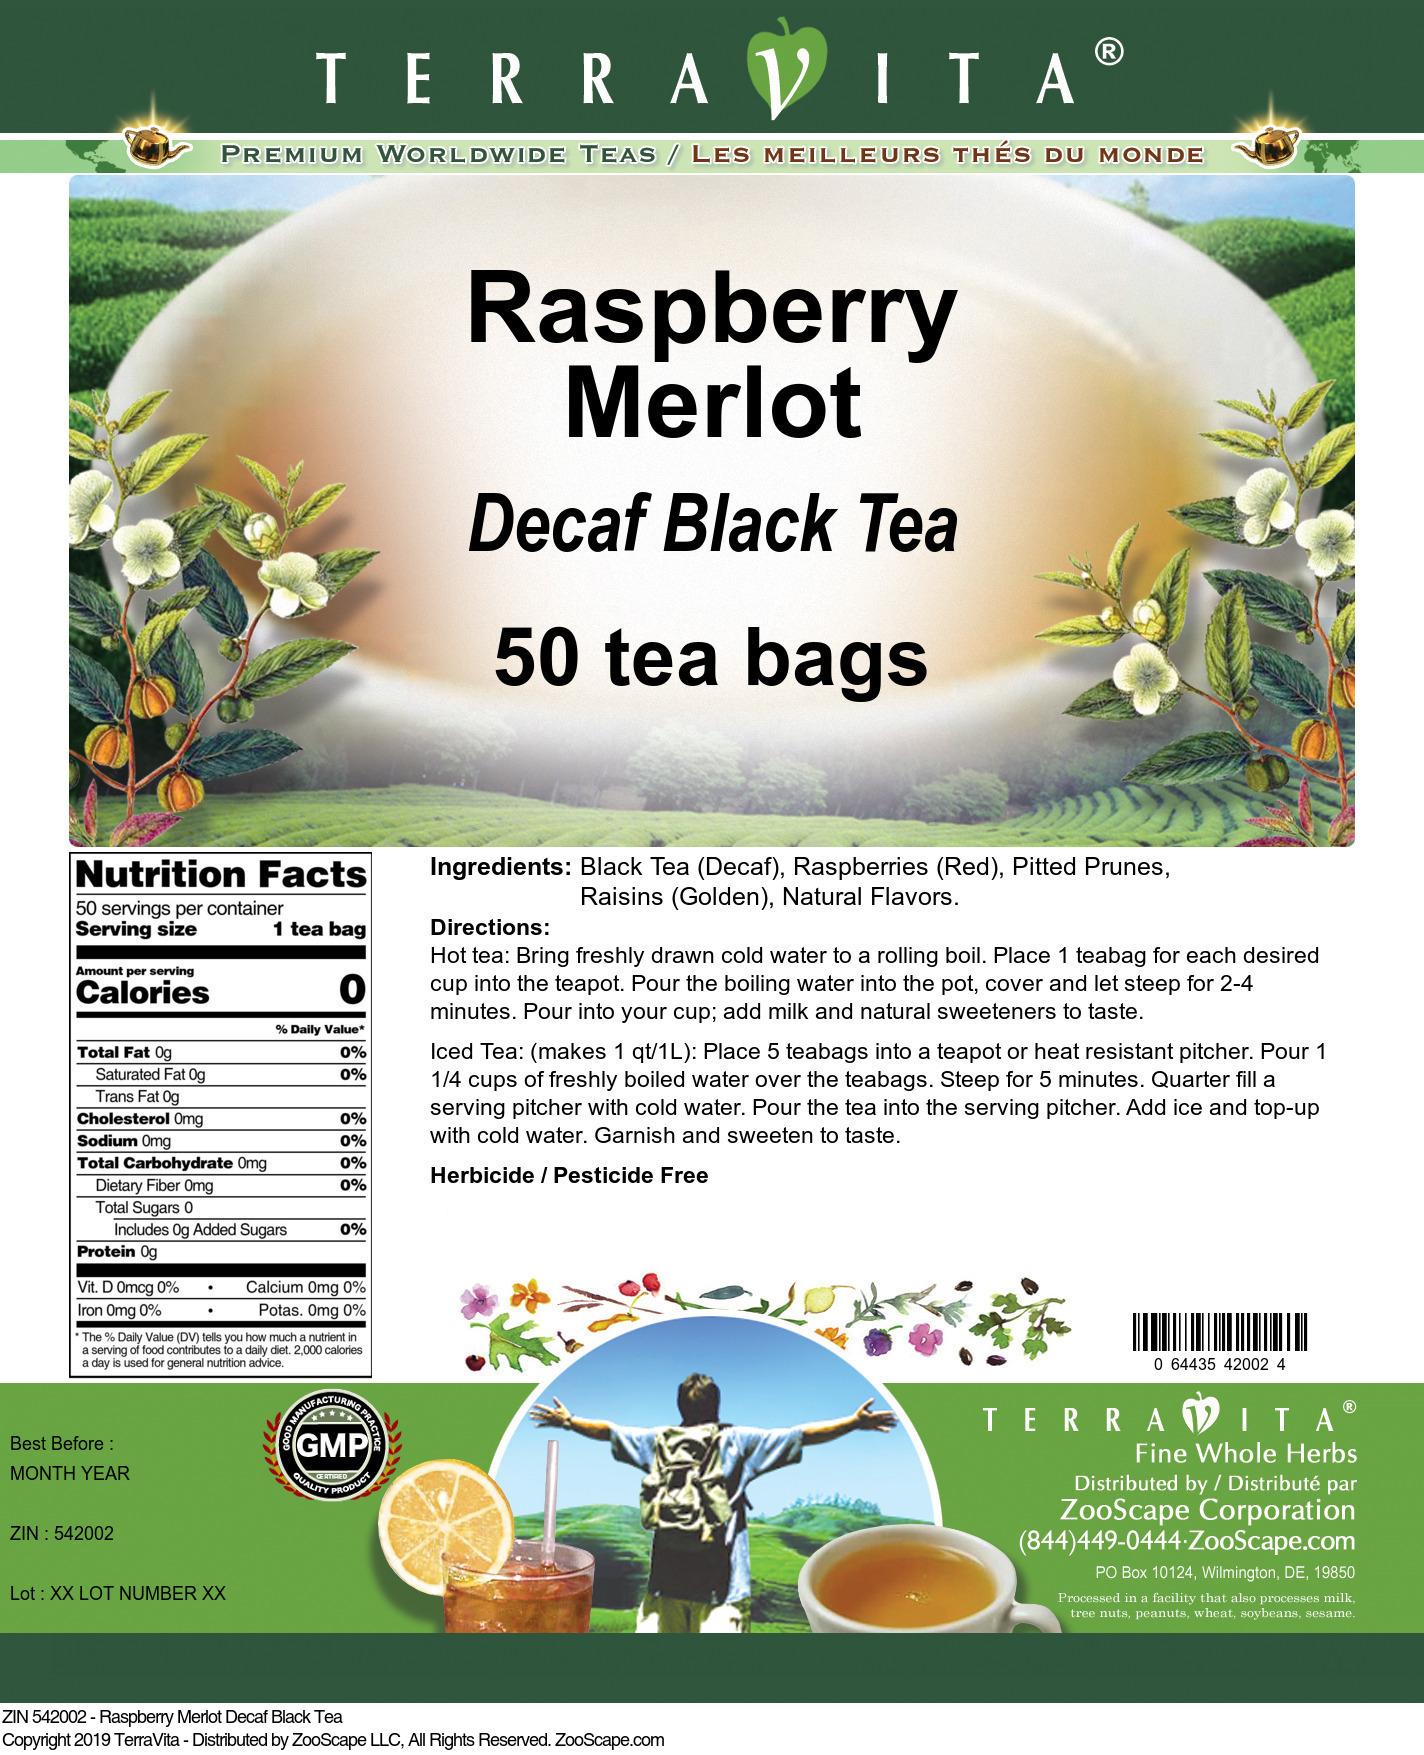 Raspberry Merlot Decaf Black Tea